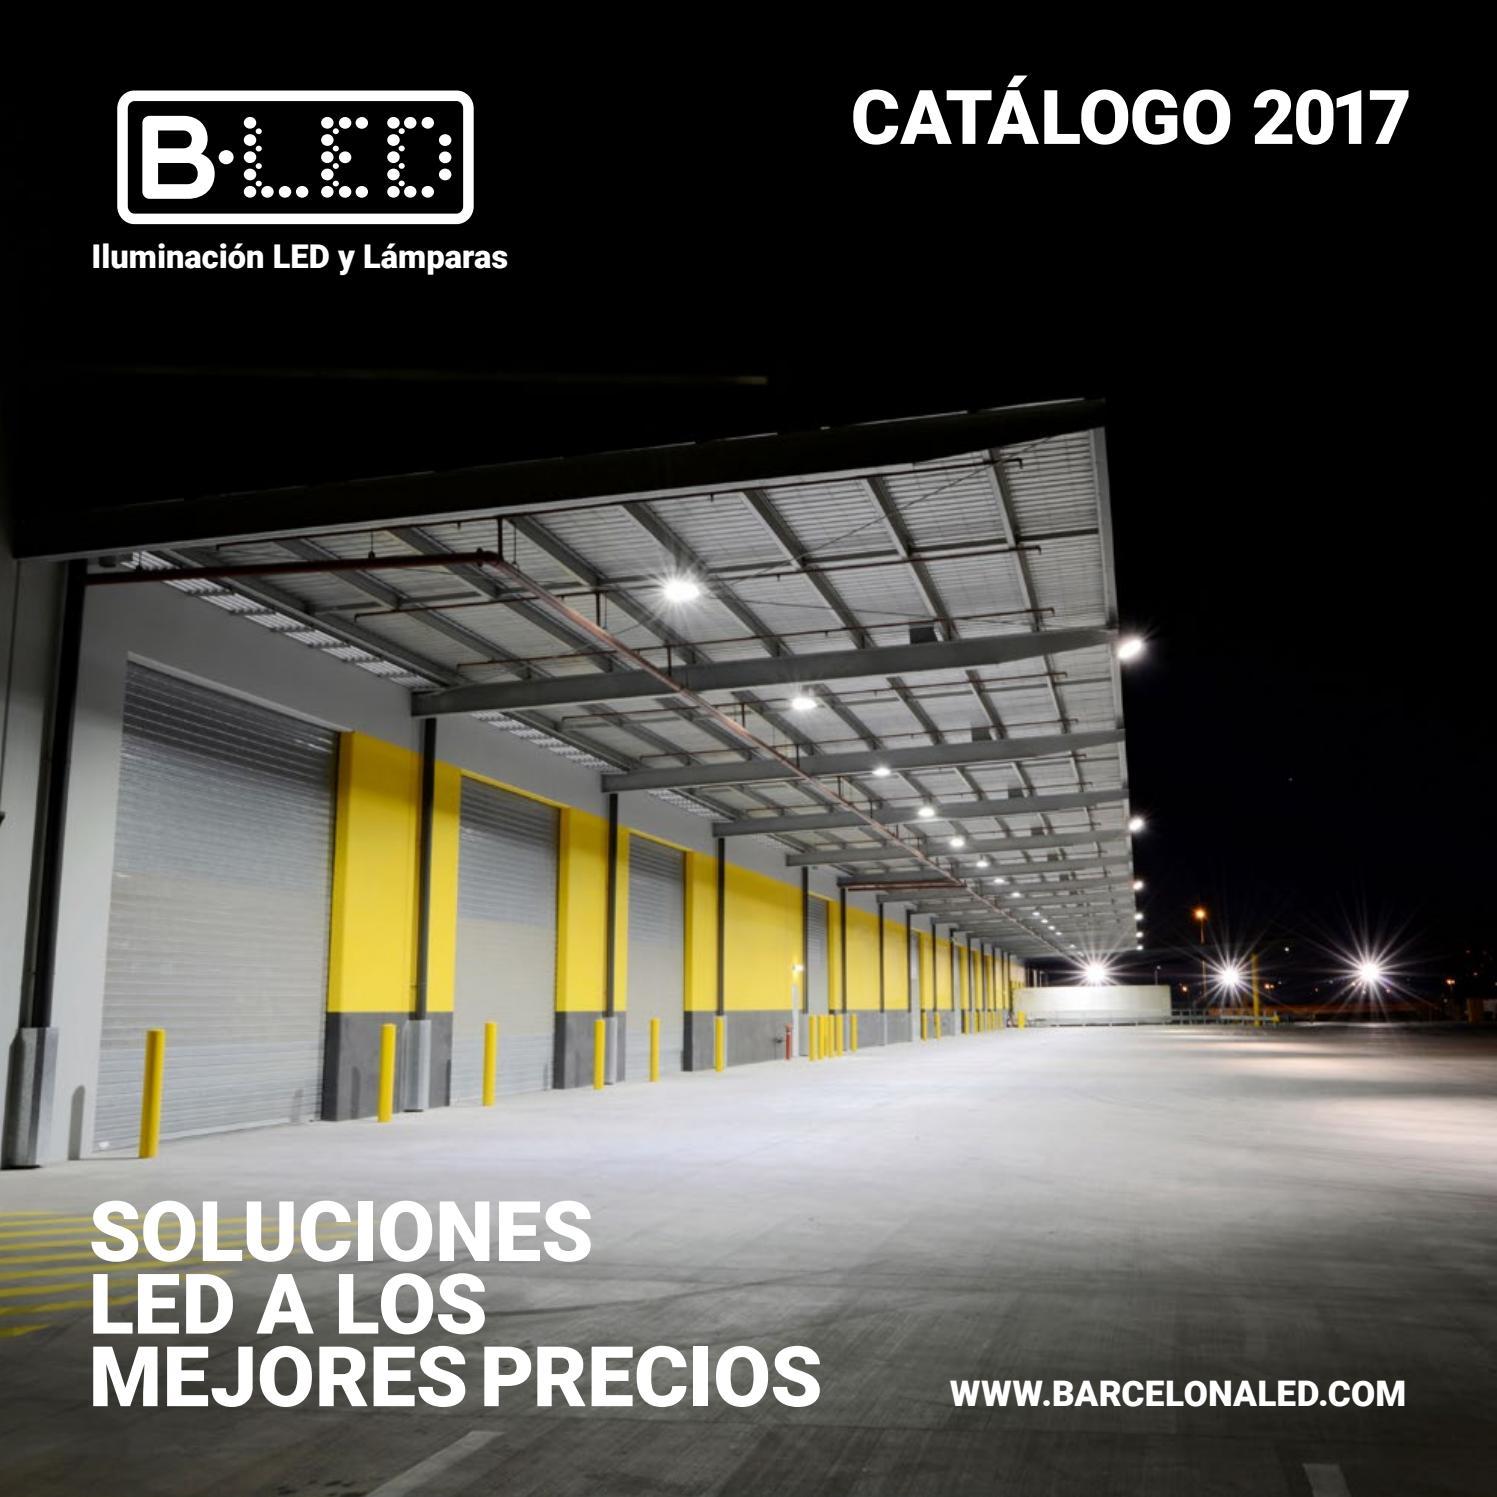 Barcelona LED Iluminación Industrial by issuu Catálogo LED 3Rjc4SLq5A